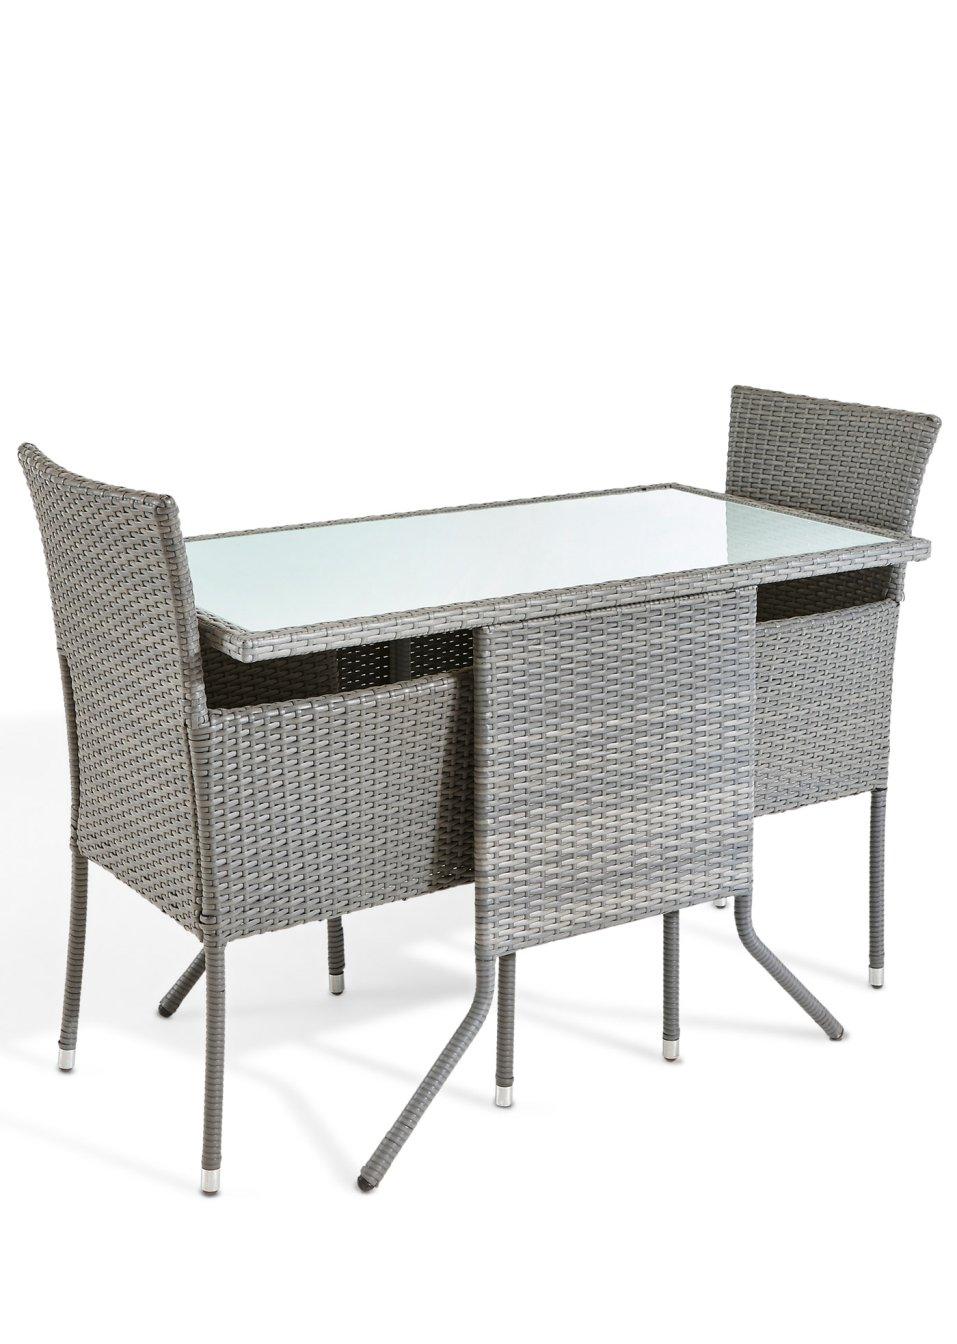 hochwertig und modern das 5 tlg balkonm bel set soroni grau. Black Bedroom Furniture Sets. Home Design Ideas